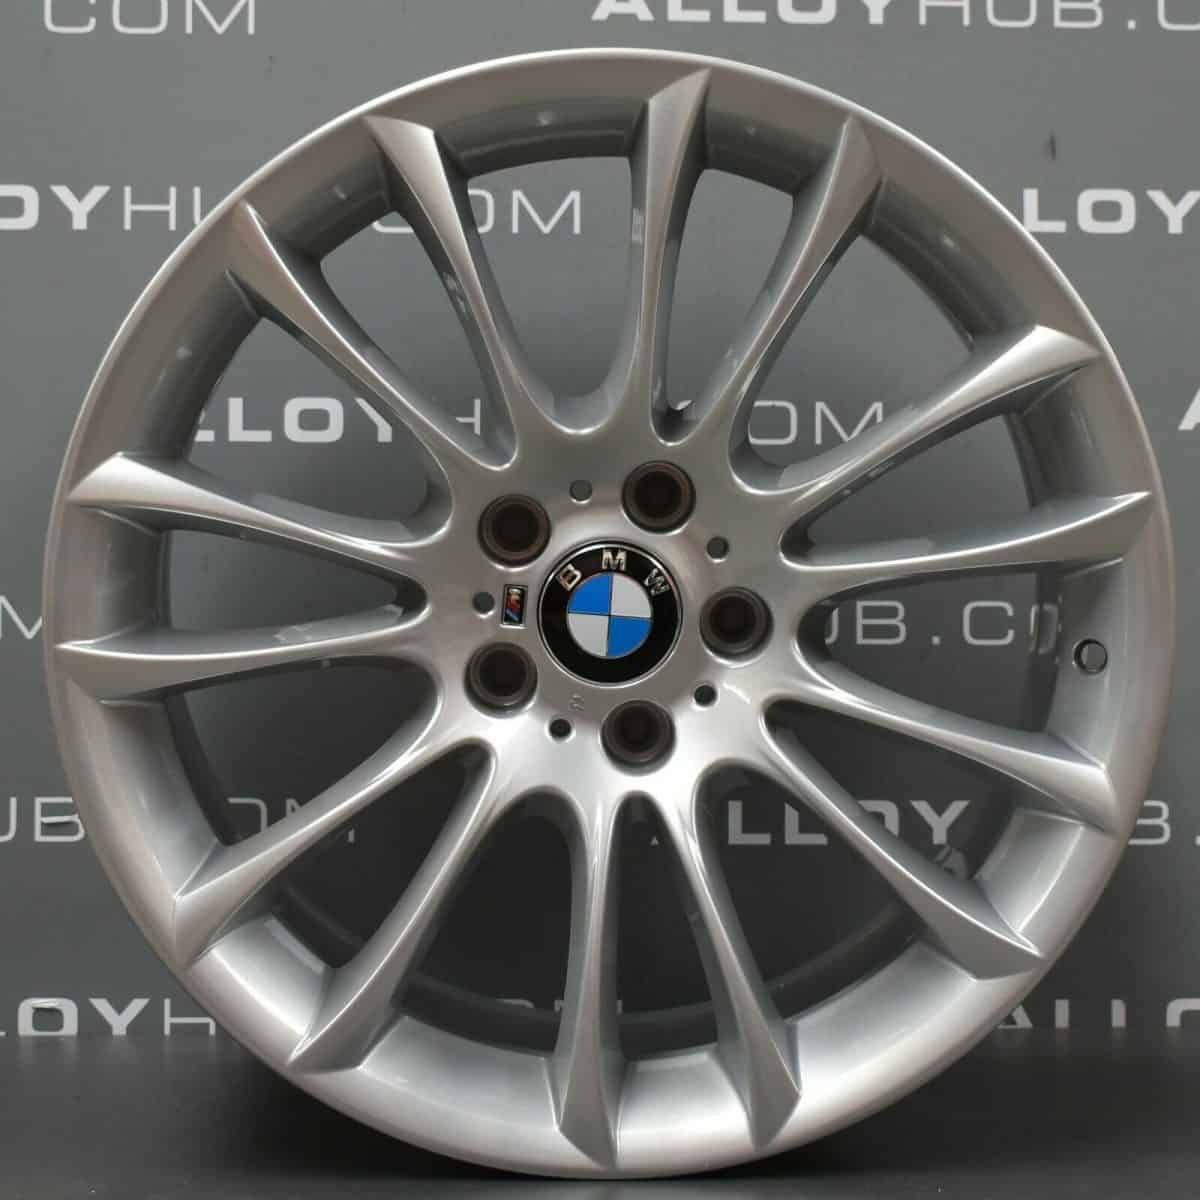 "Genuine BMW 5/7 Series 302M Sport V Spoke 19"" Inch Alloy Wheels with Silver Finish 36117841819 36117841822"